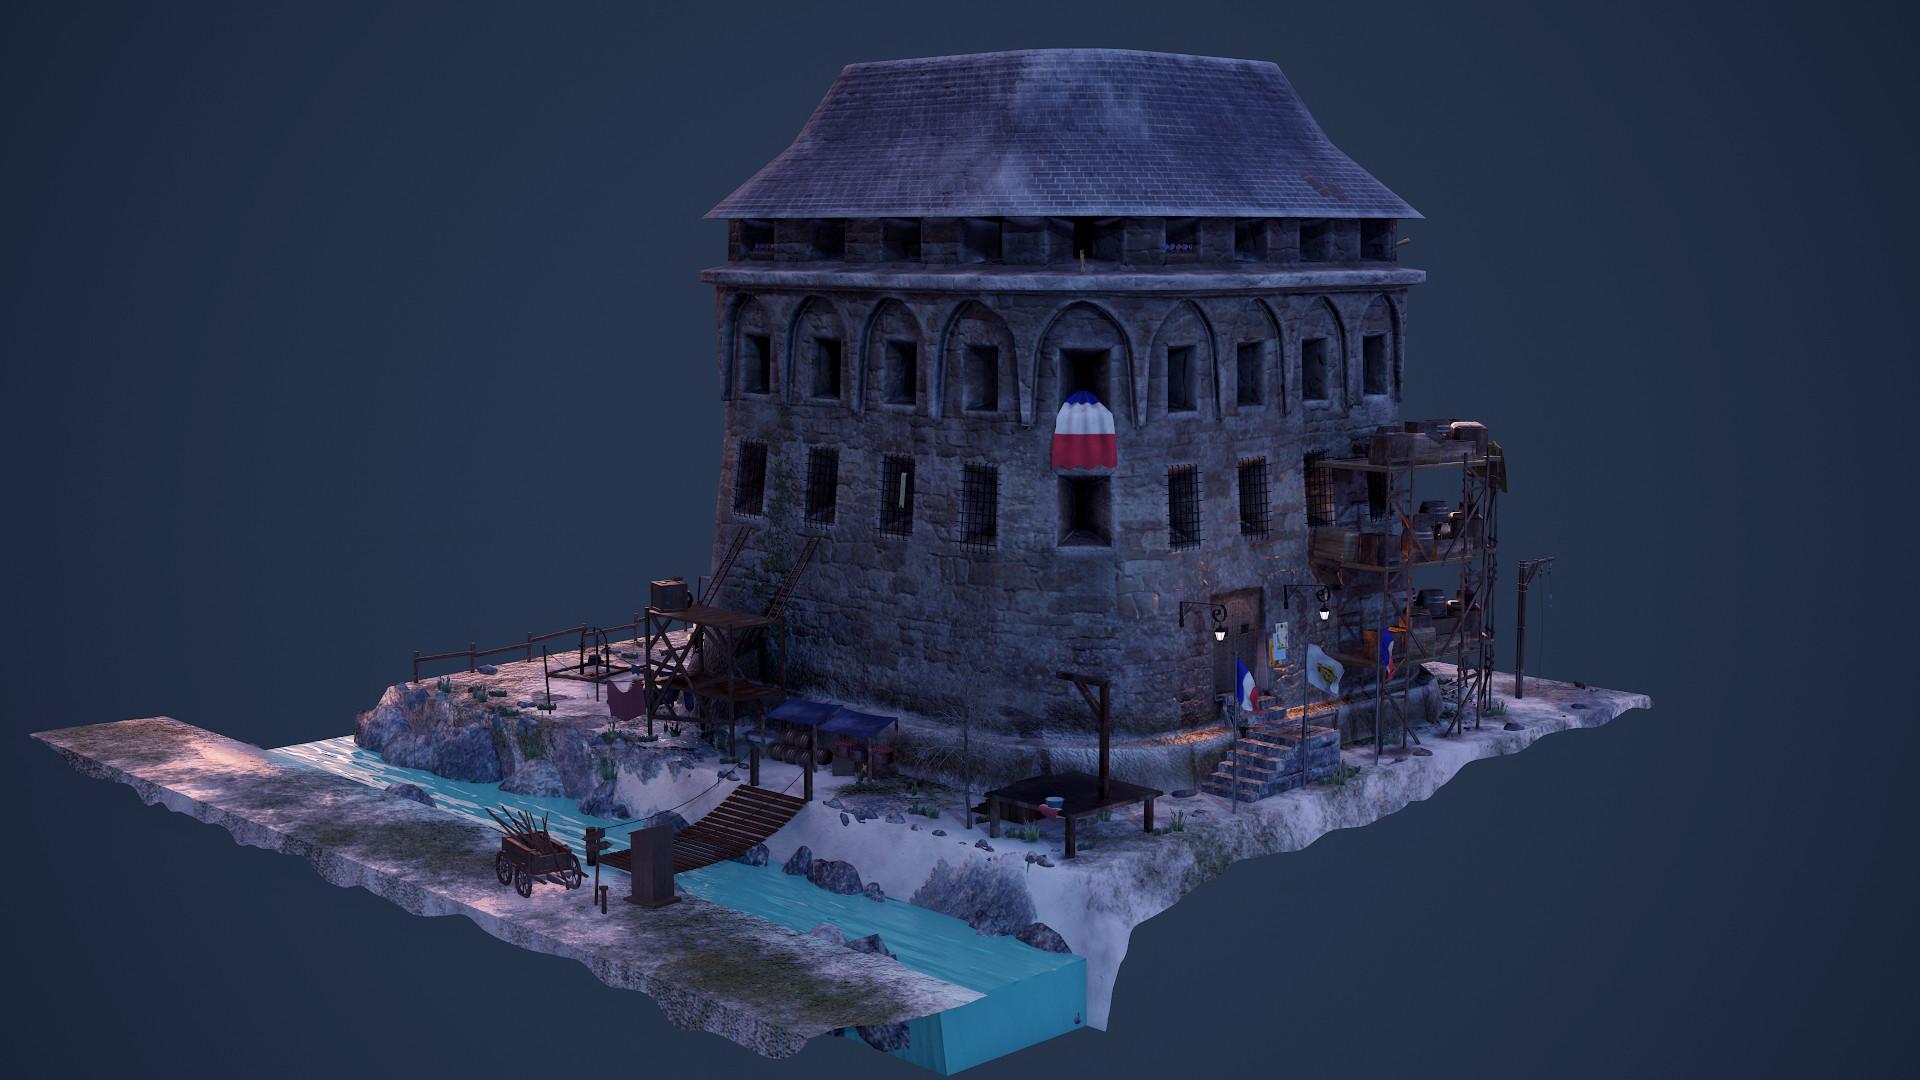 Dani palacio santolaria screenshot027